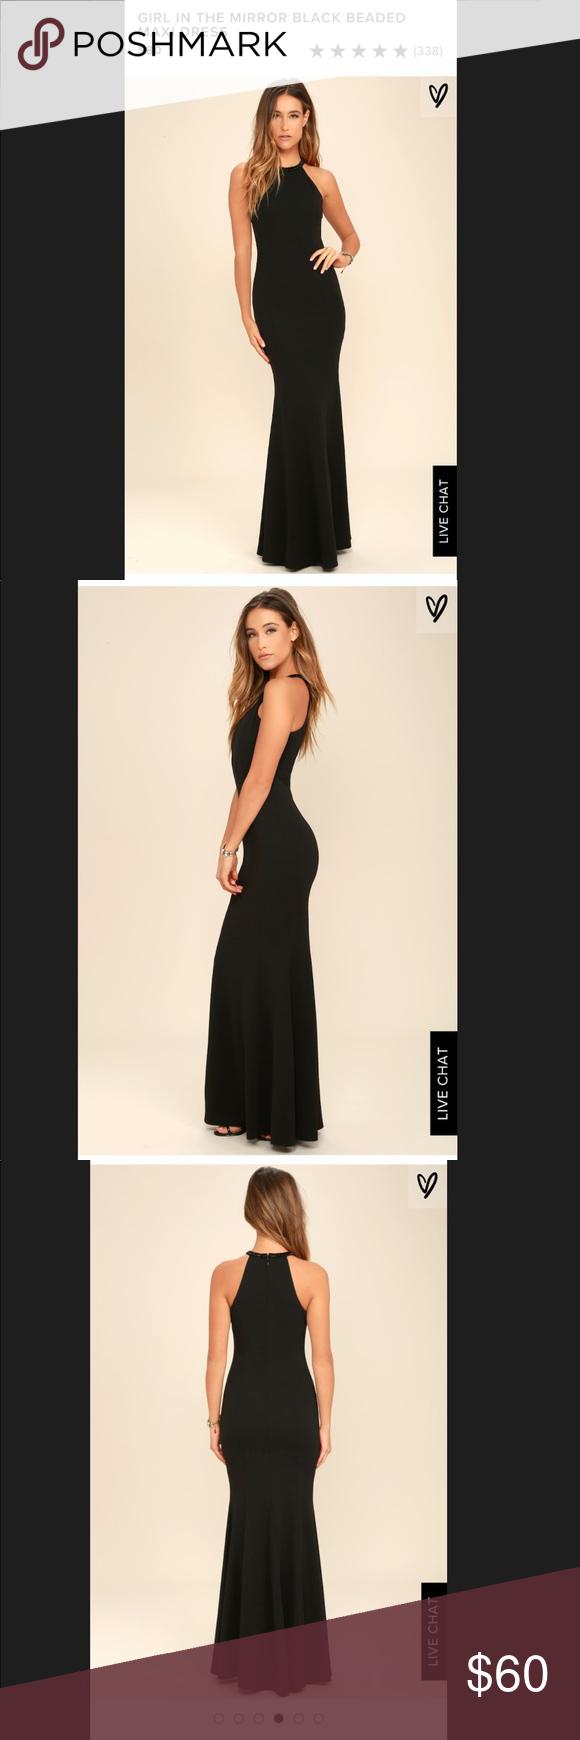 738172b78e2 Long Formal Dresses Lulus - Gomes Weine AG